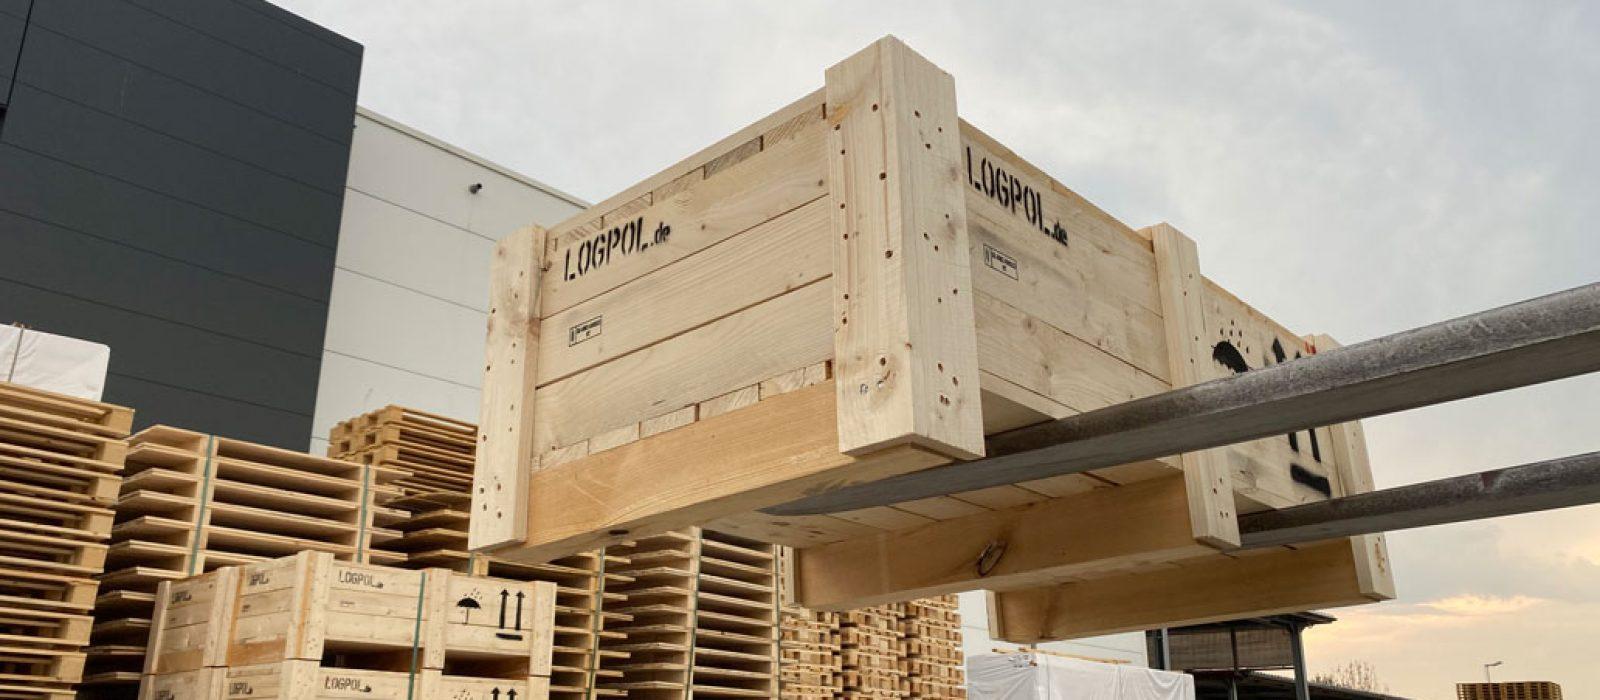 Holzkiste-1200x600x300-NRW-LOGPOL